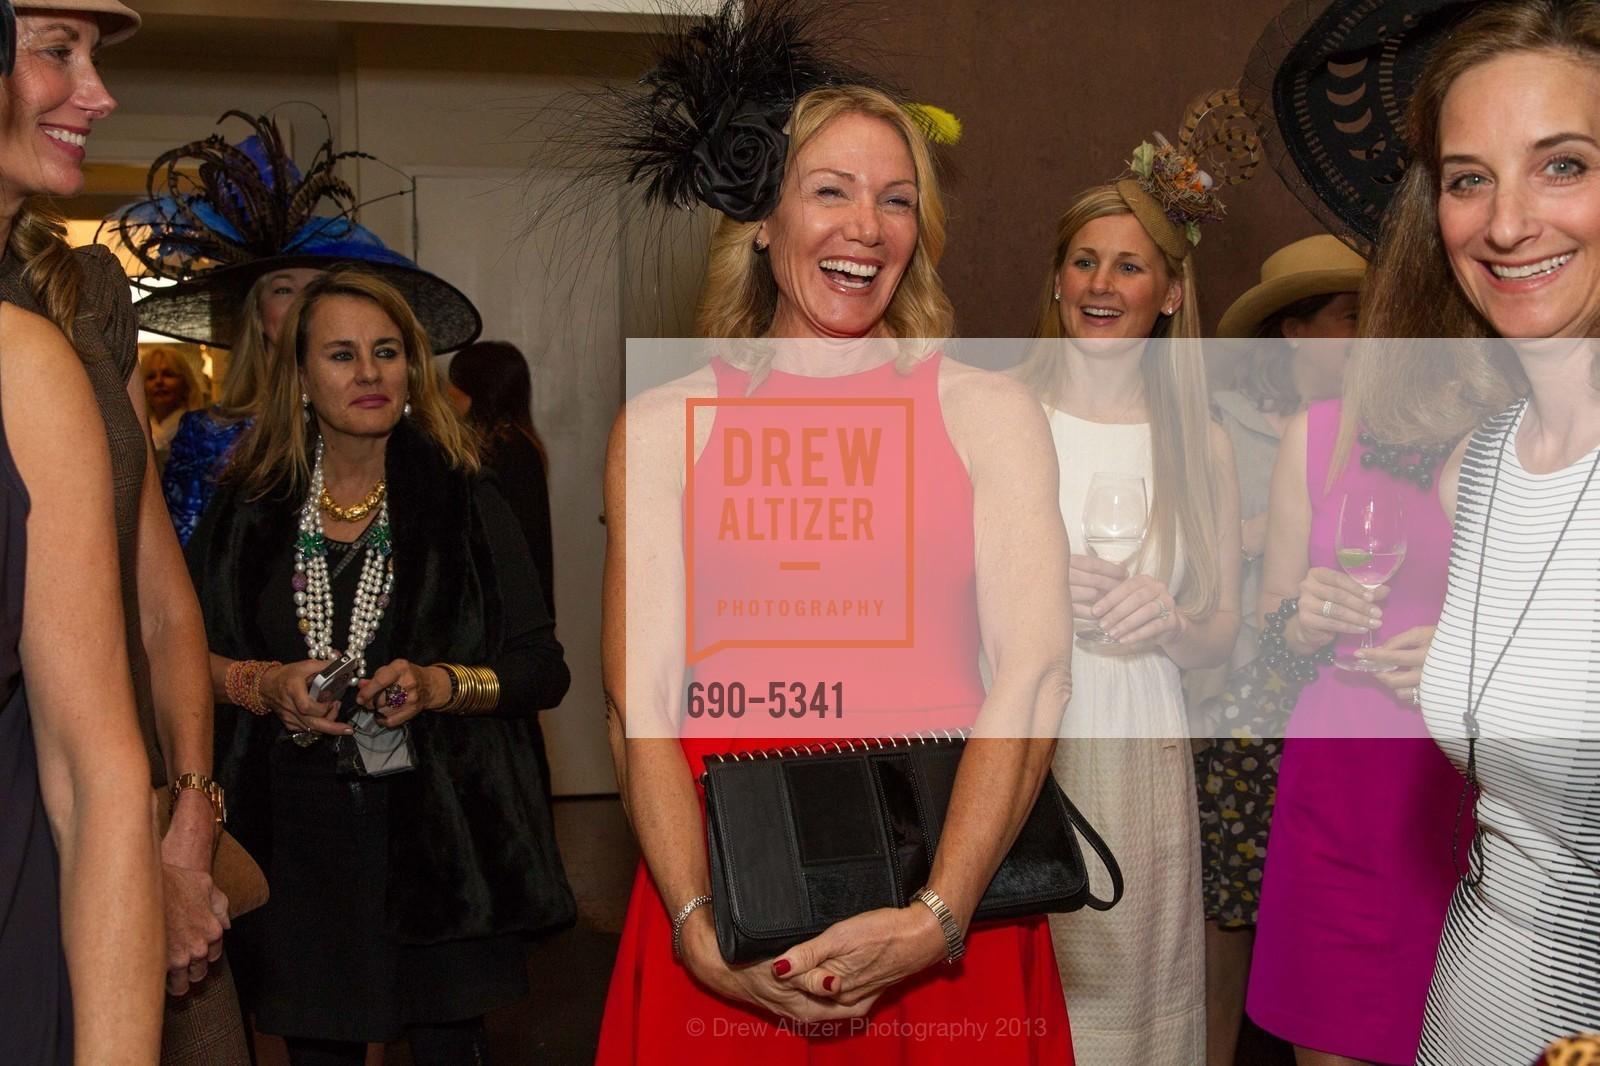 Susan Dunlevy, Rosemary Baker, Susan Dossetter, Photo #690-5341